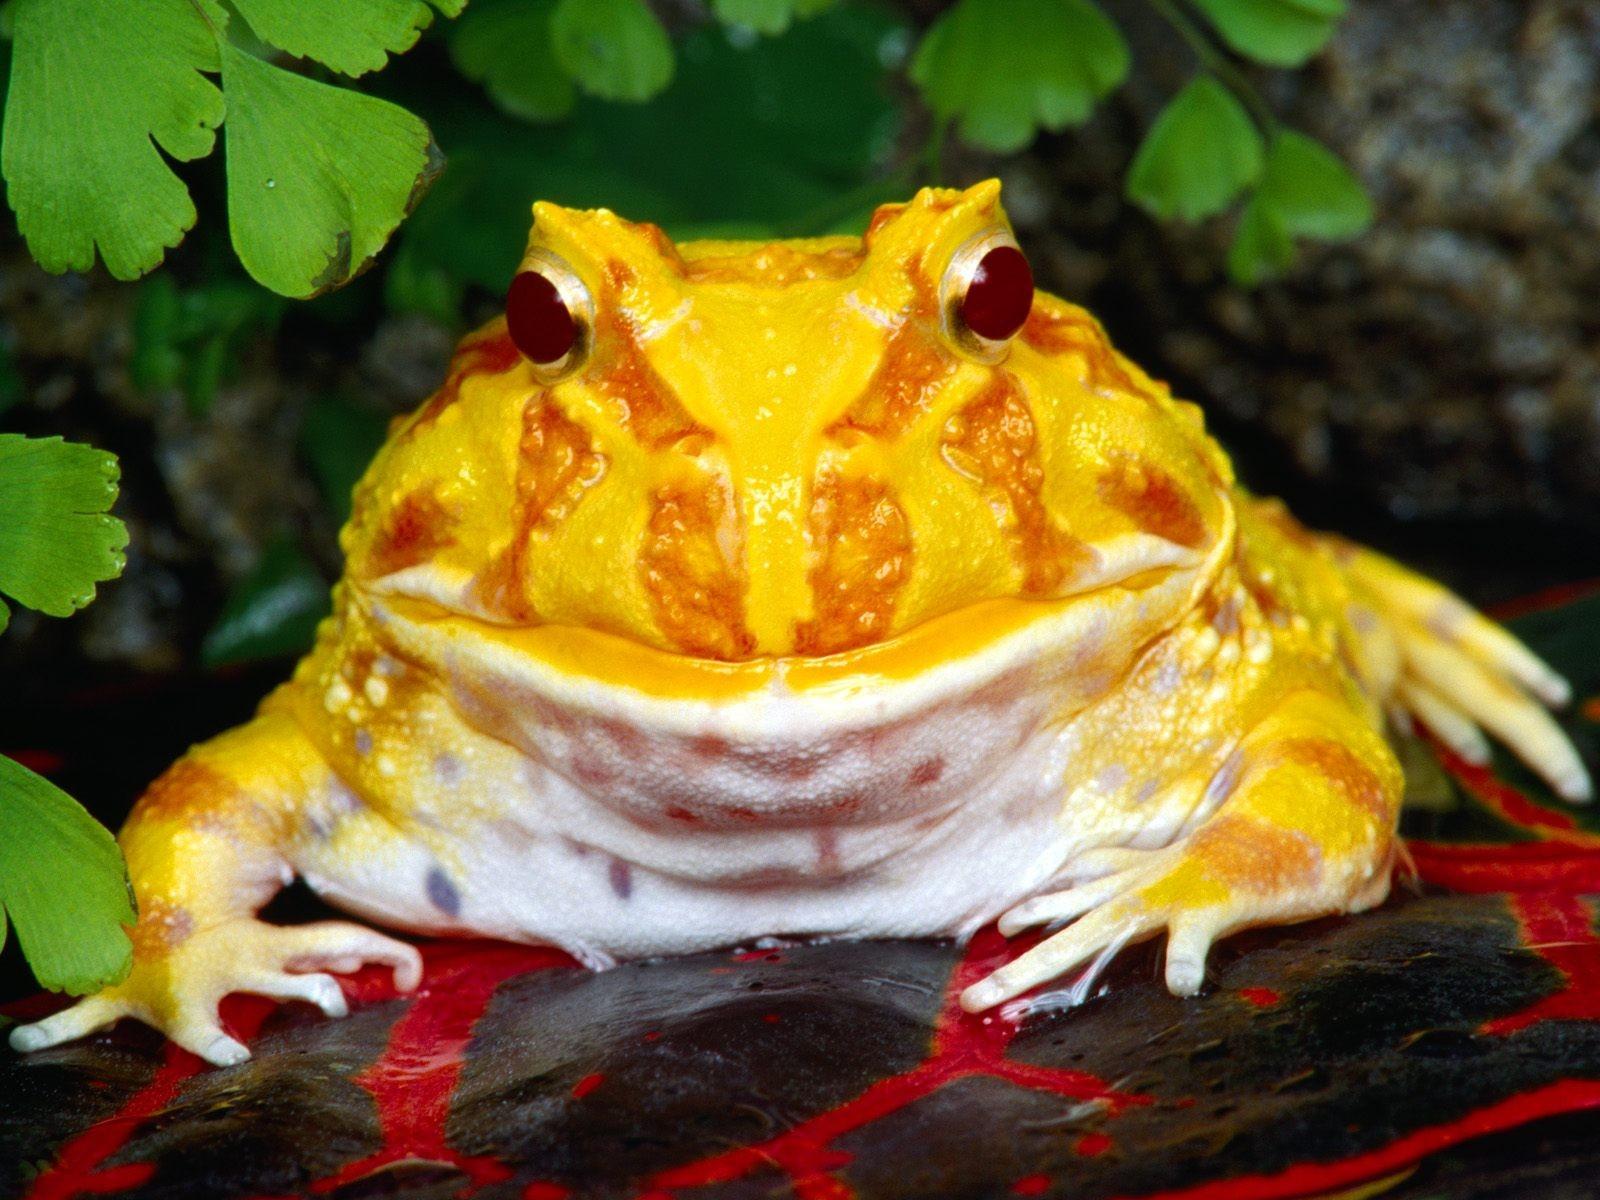 Ядовитая жаба обои (картинки, фото), желтая лягушка, Ядовитая жаба ...